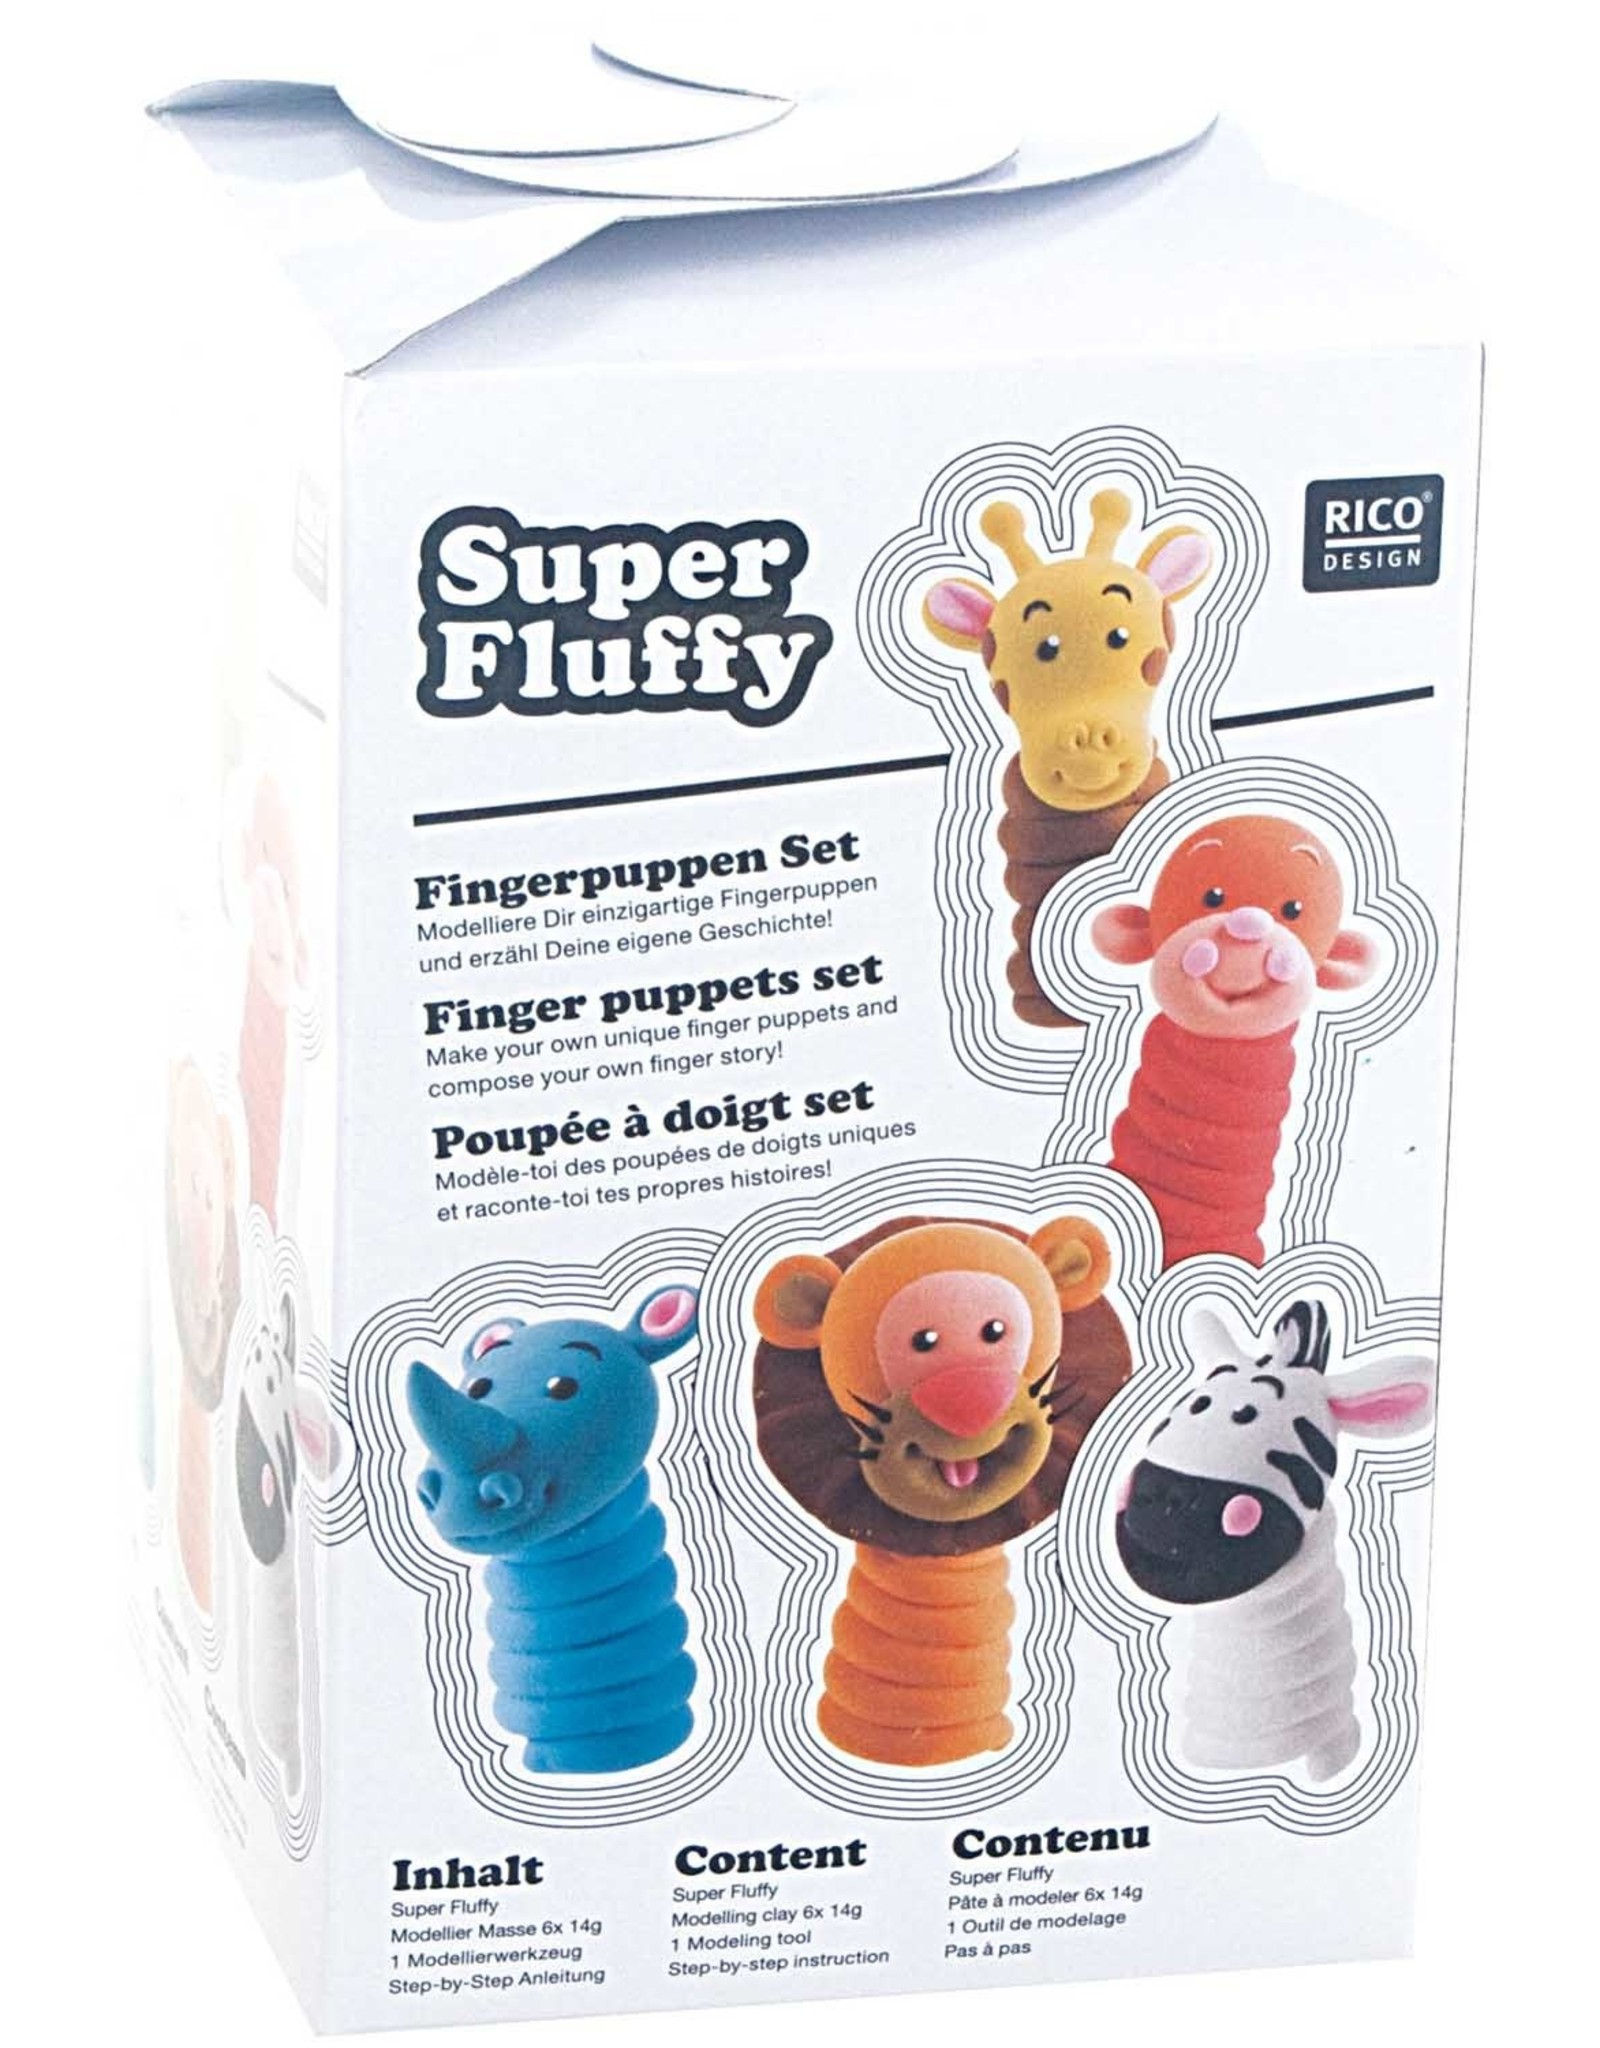 rico design rico design Super fluffy vingerpopjes